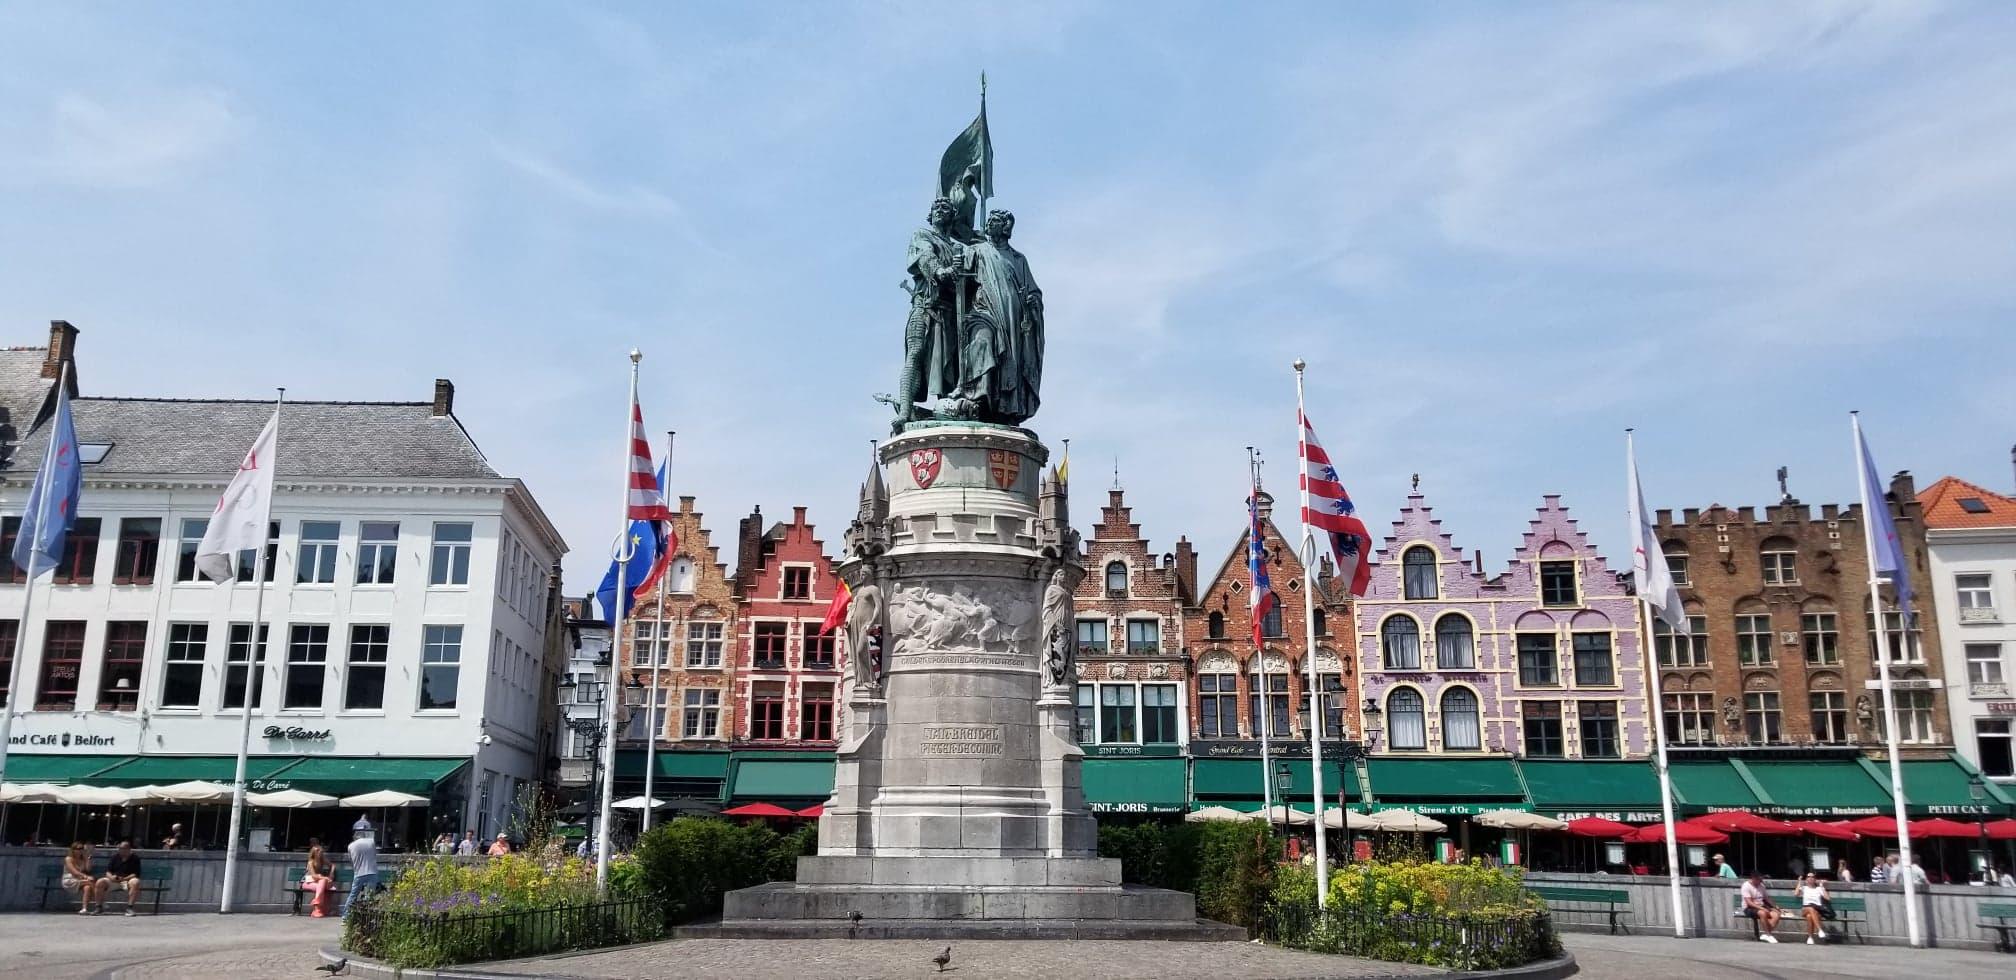 Brugge Markt Square